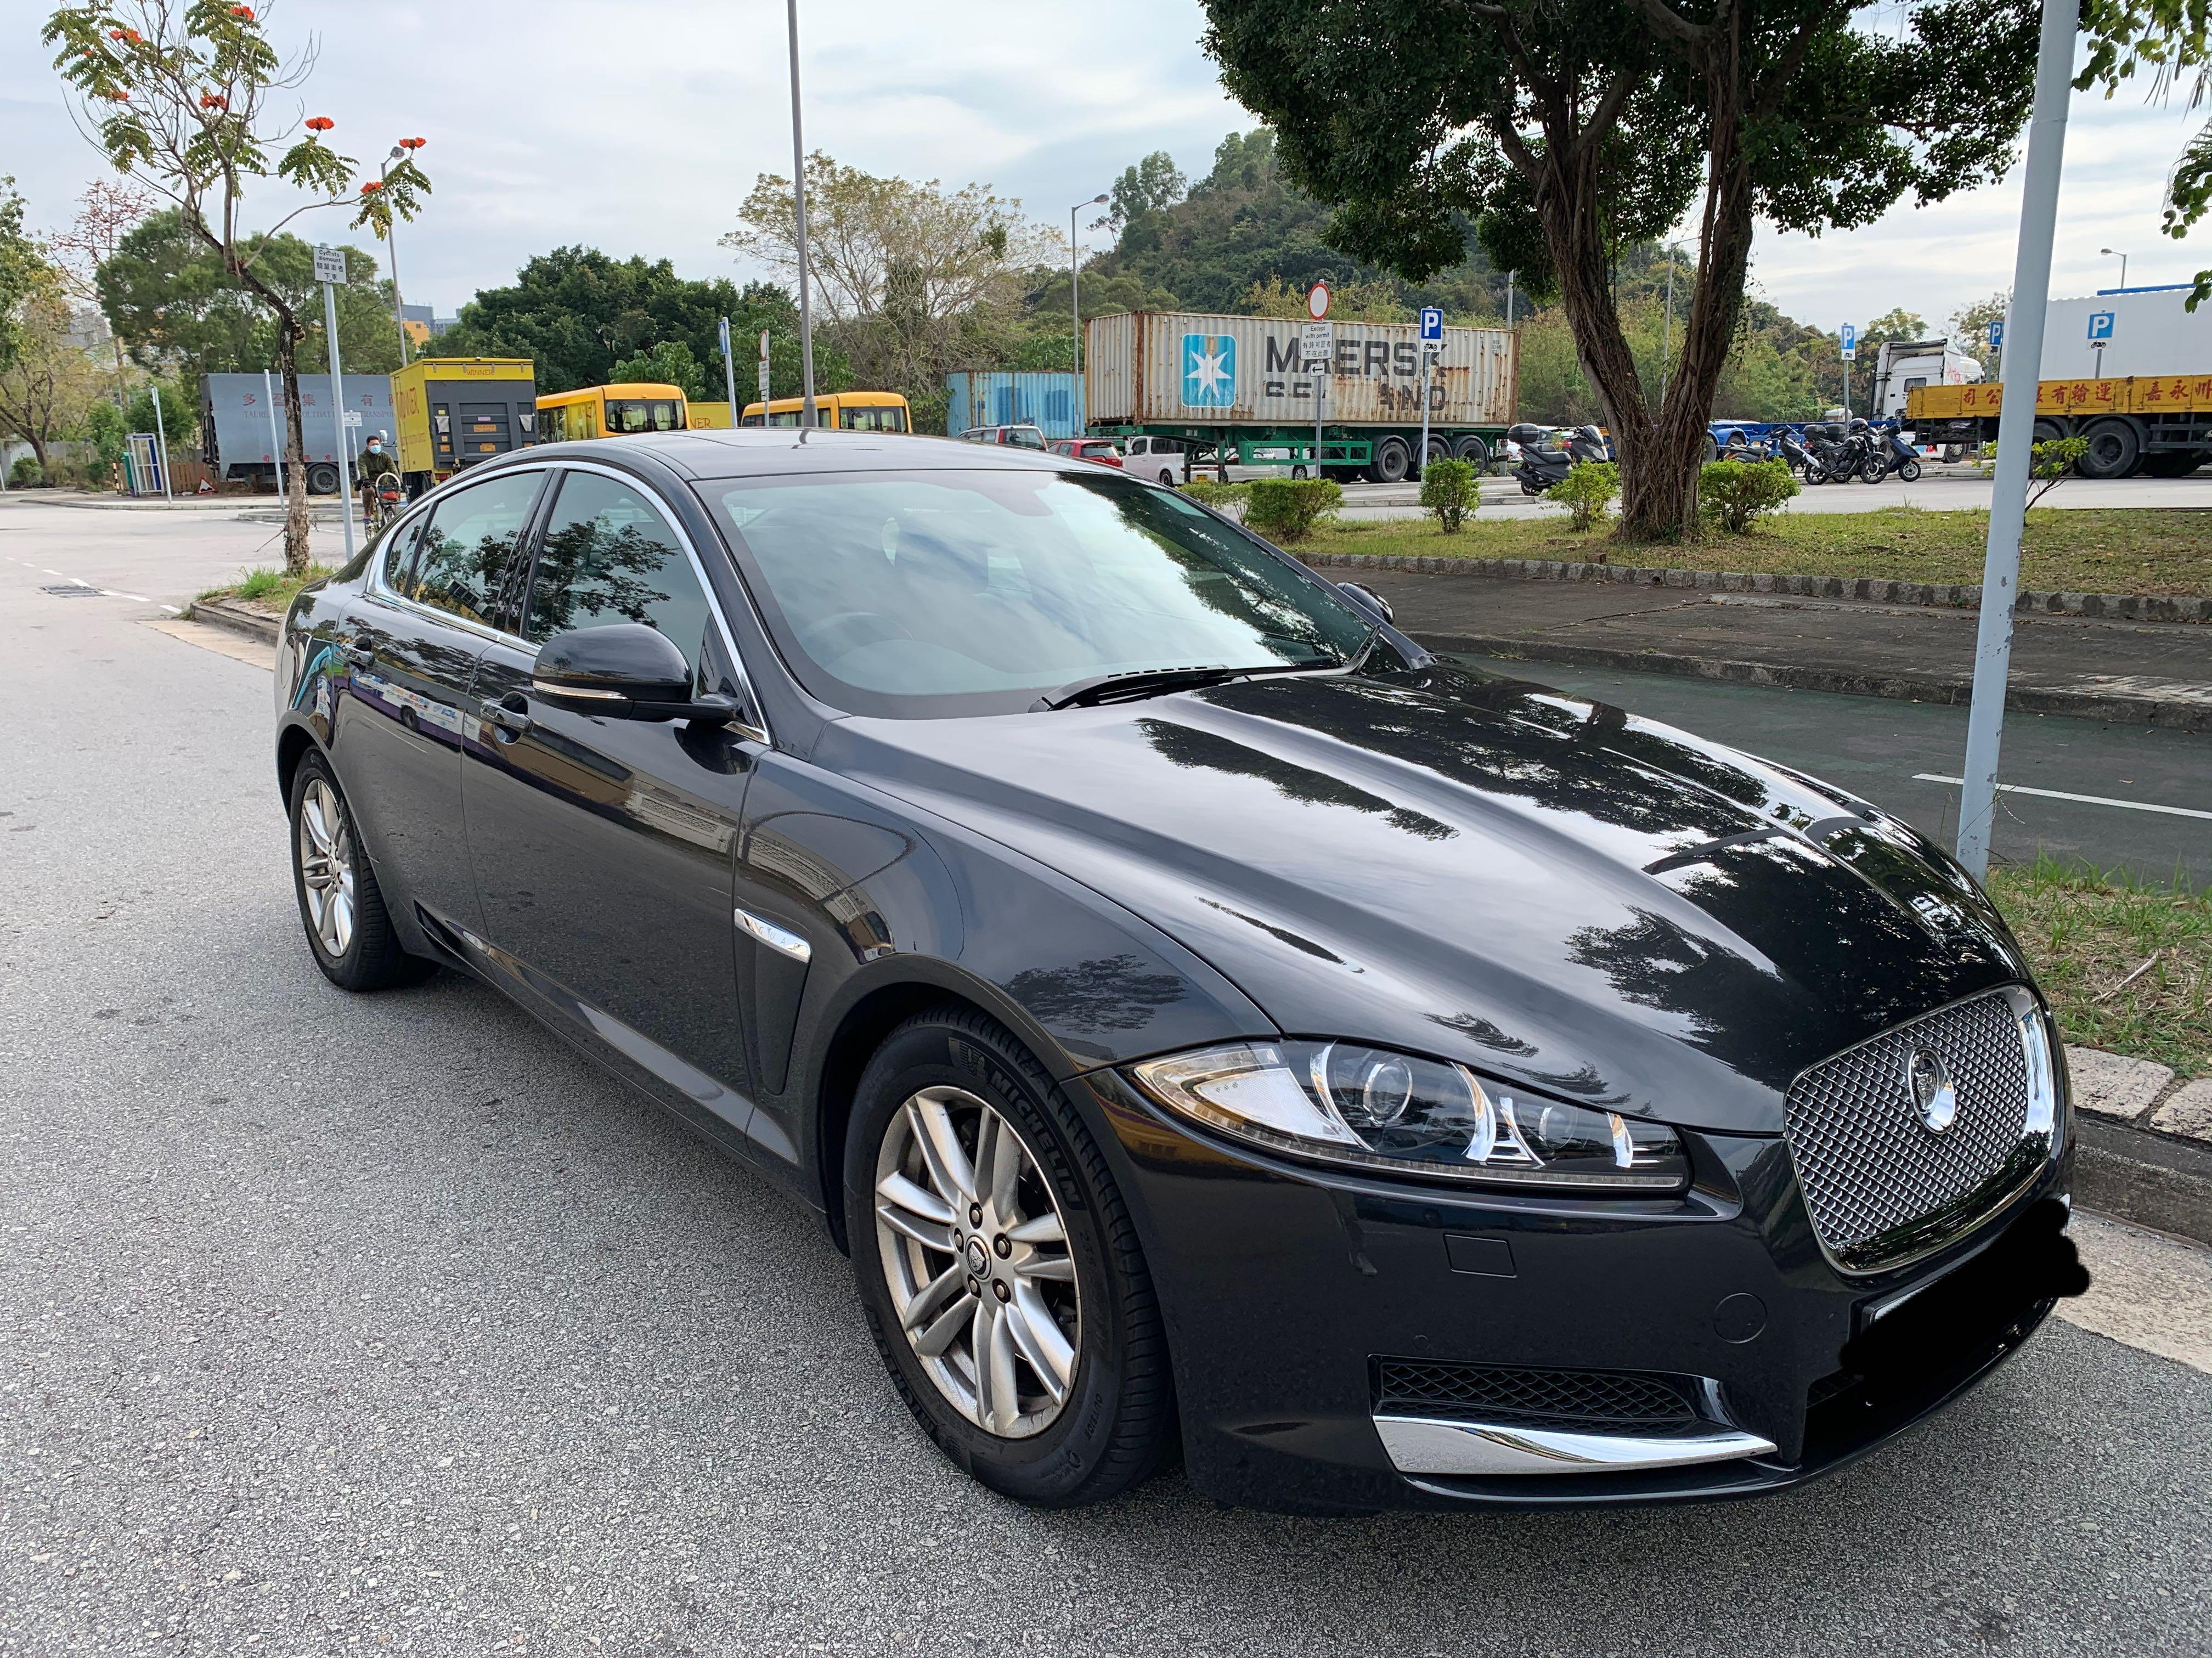 Jaguar XF 2.0 Luxury (A)